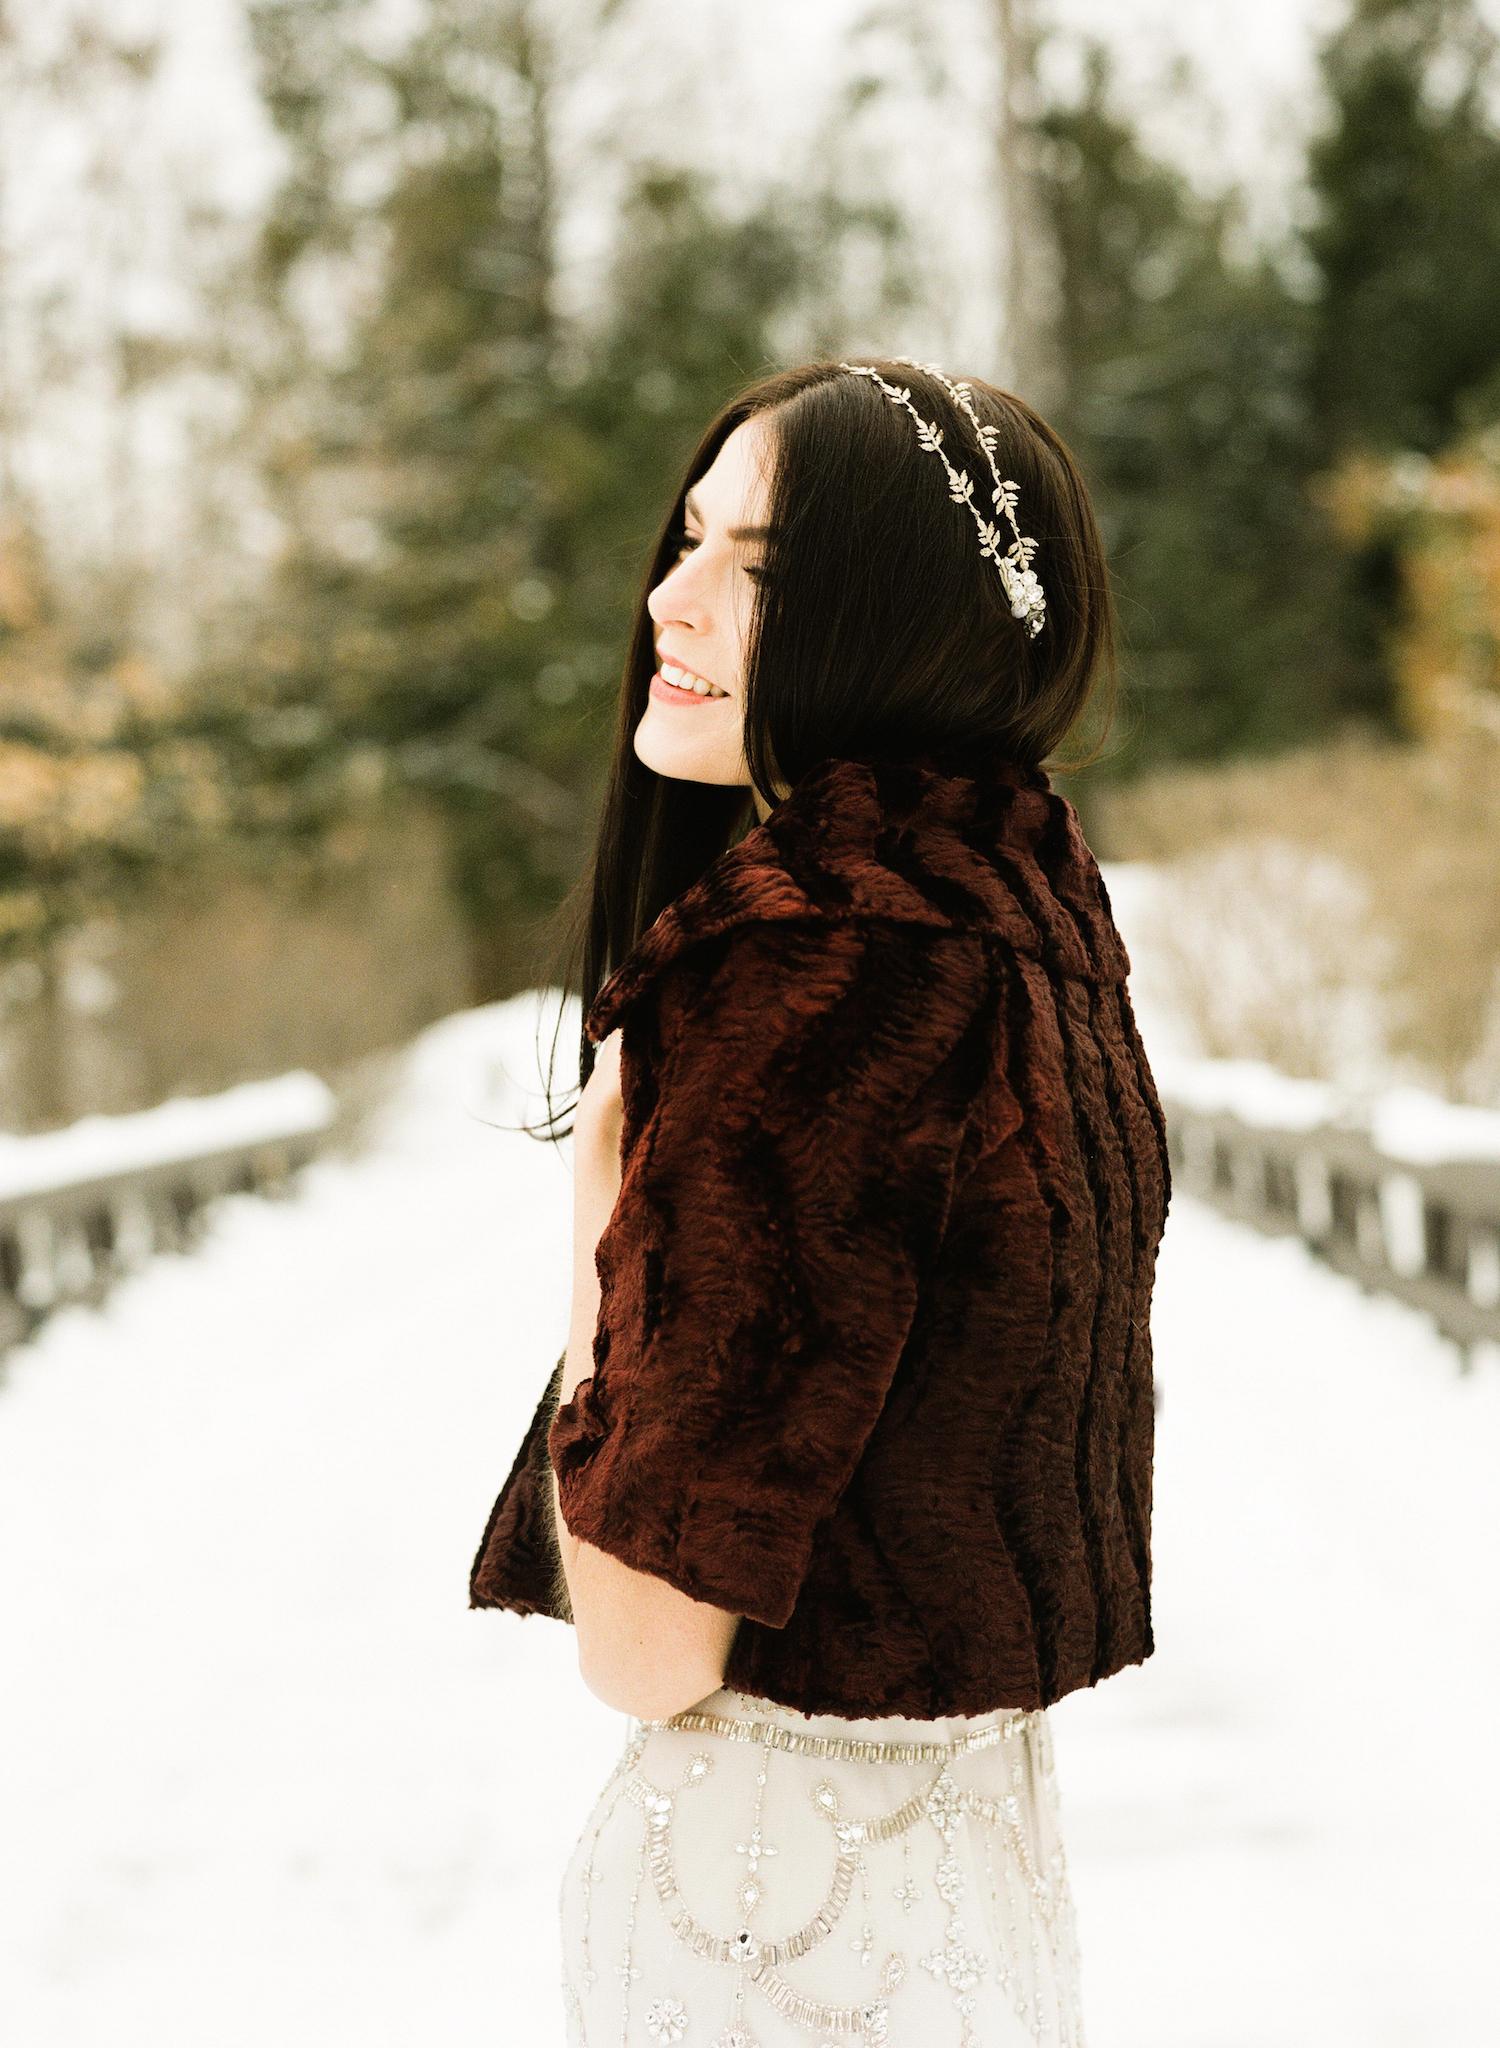 Winter Editorial-JennyPackham-LindsayMaddenPhotography-13 copy.jpg